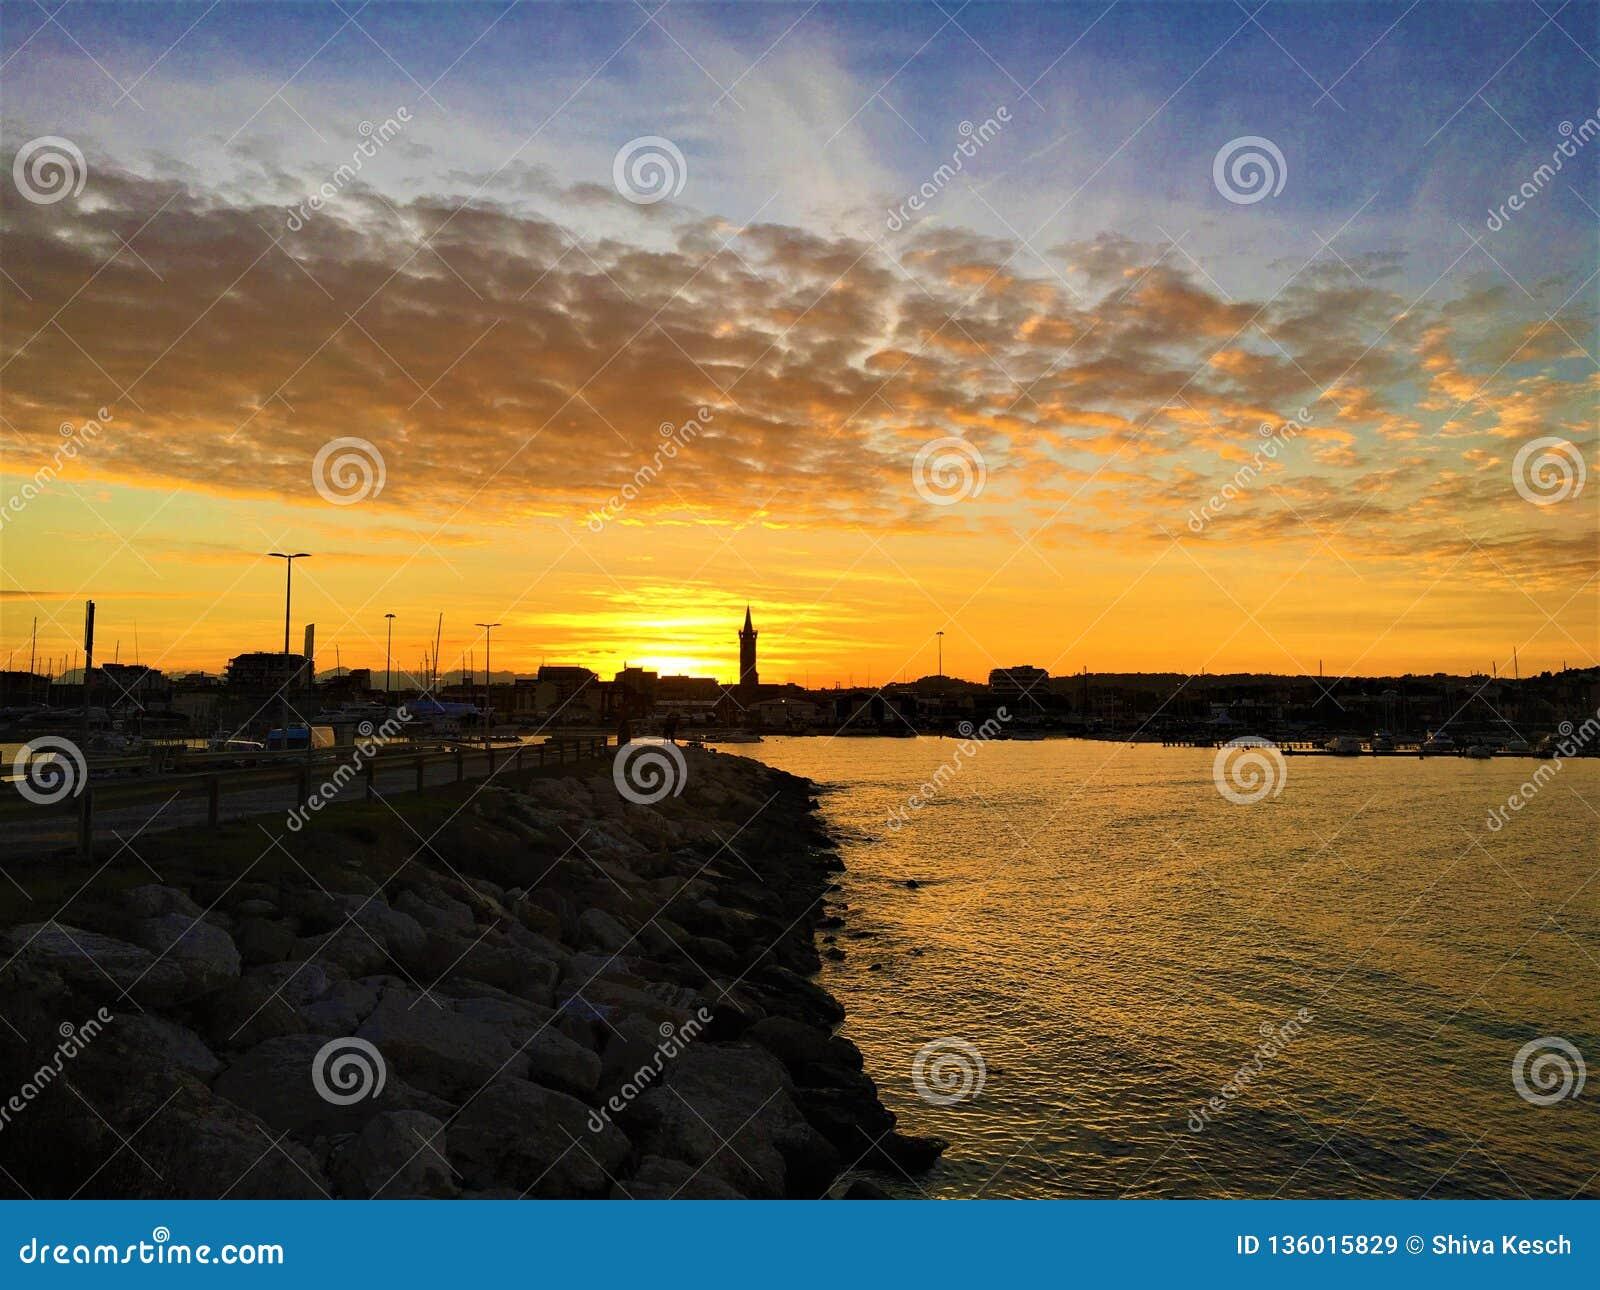 Overzees, zonsondergang, water, hemel en wolken in Civitanova Marche, Italië